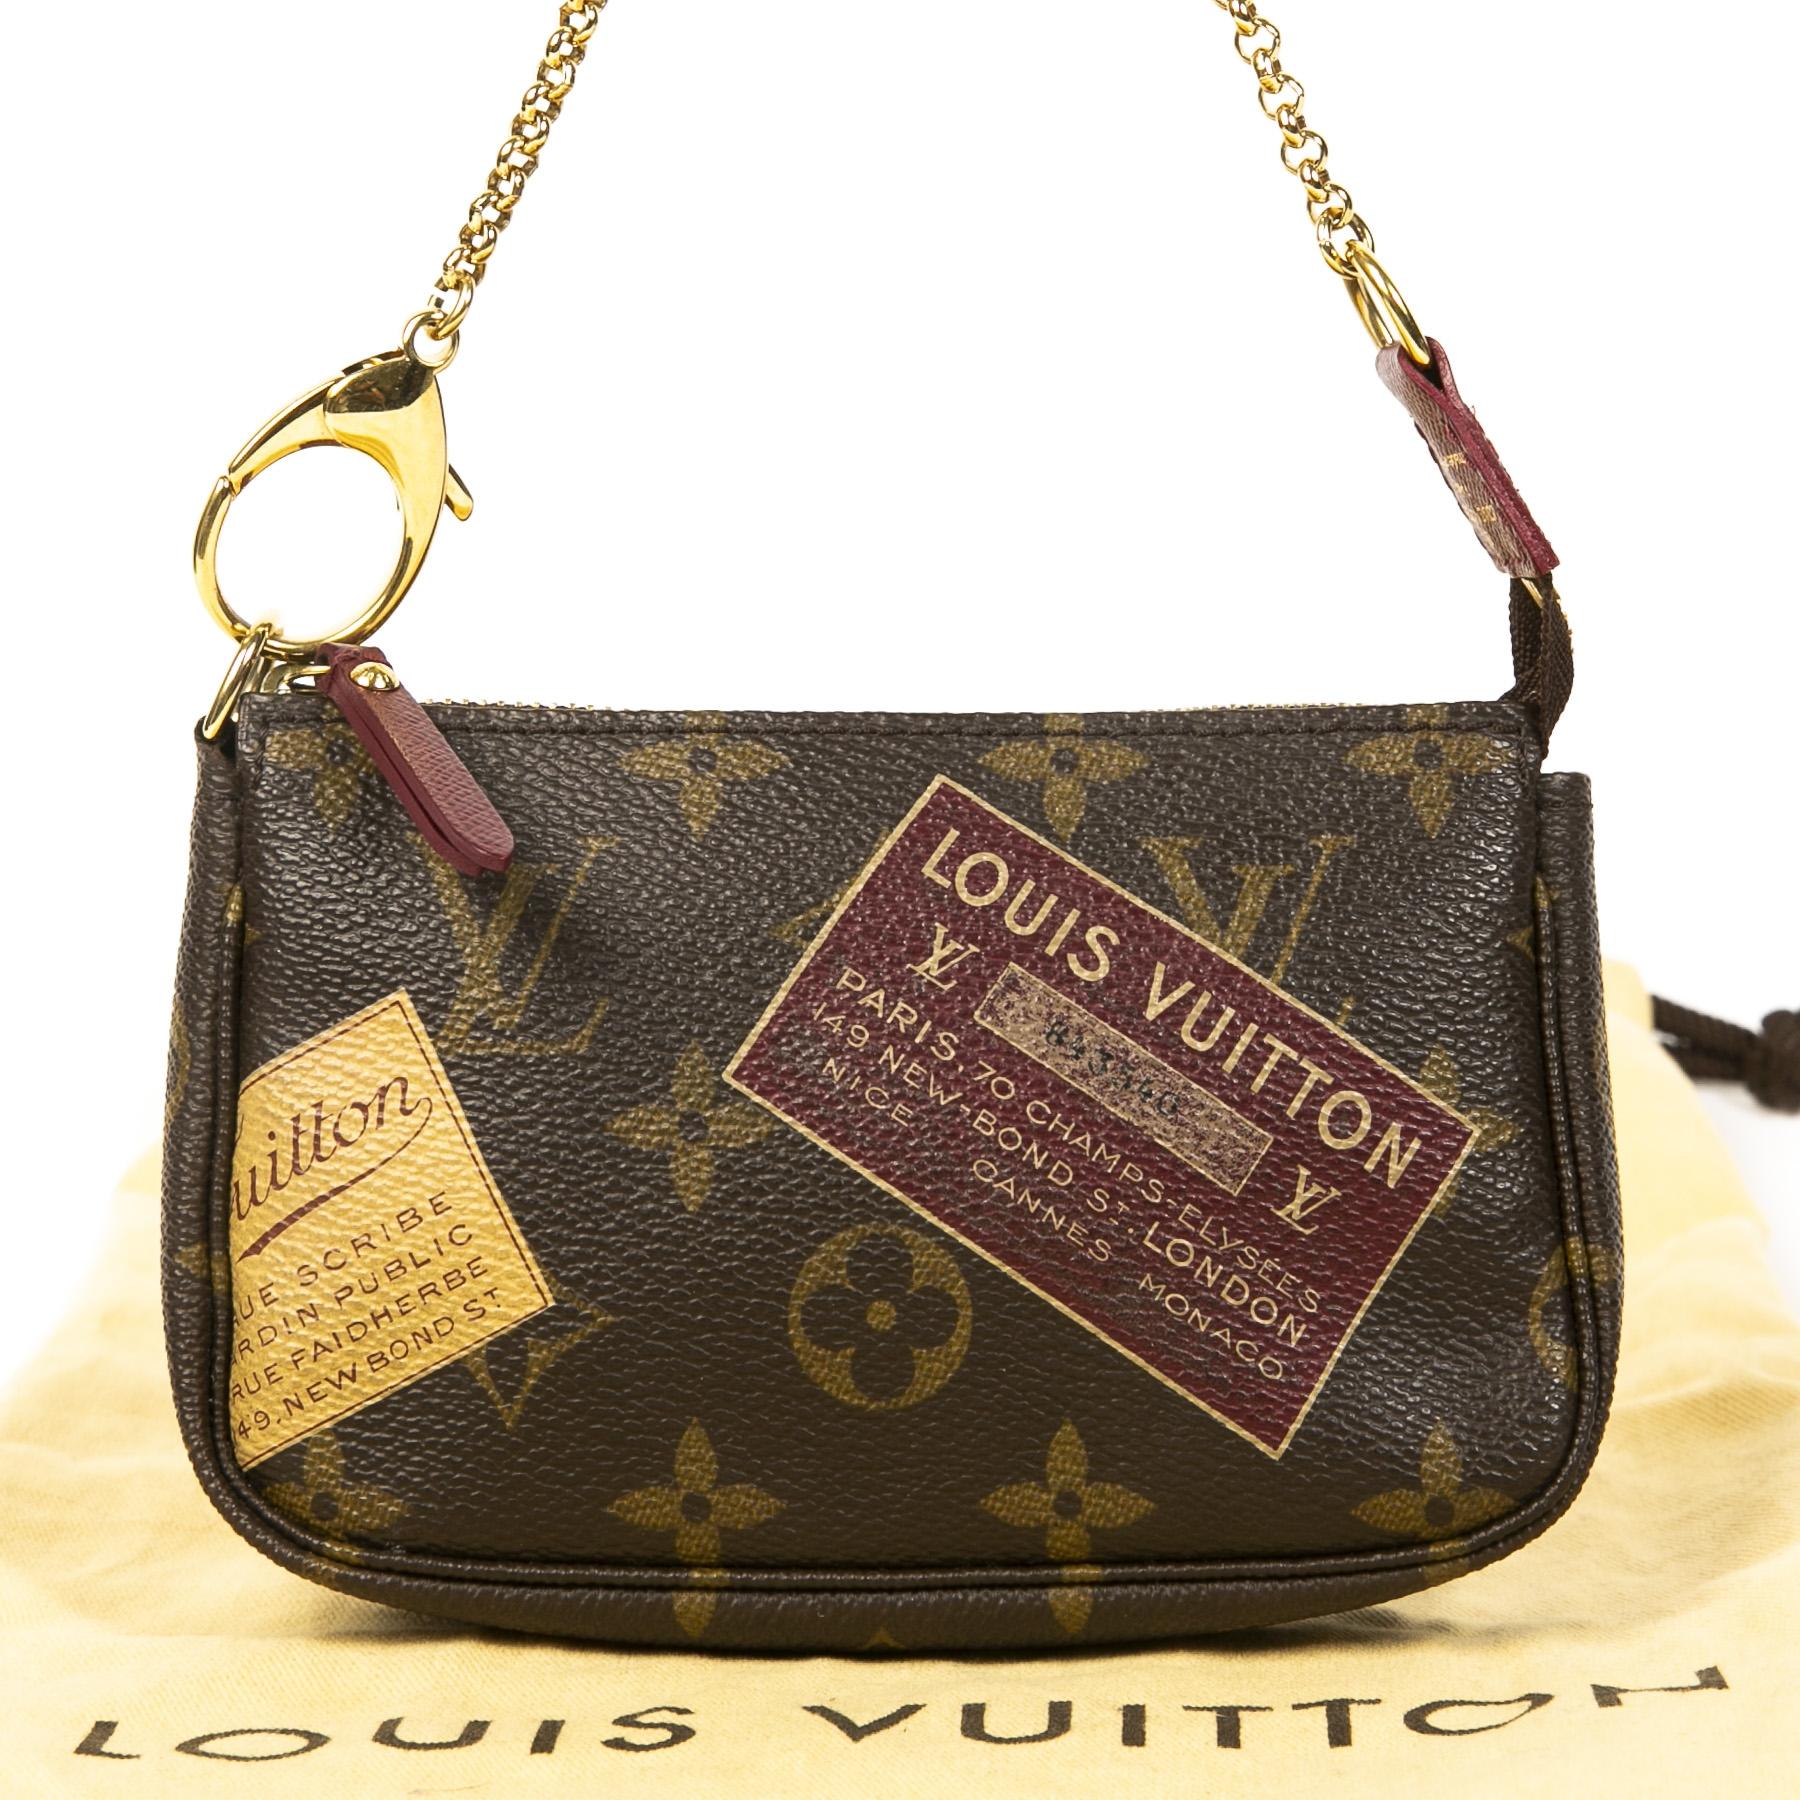 b58f367a Labellov Buy authentic vintage Louis Vuitton online with Labellov ...